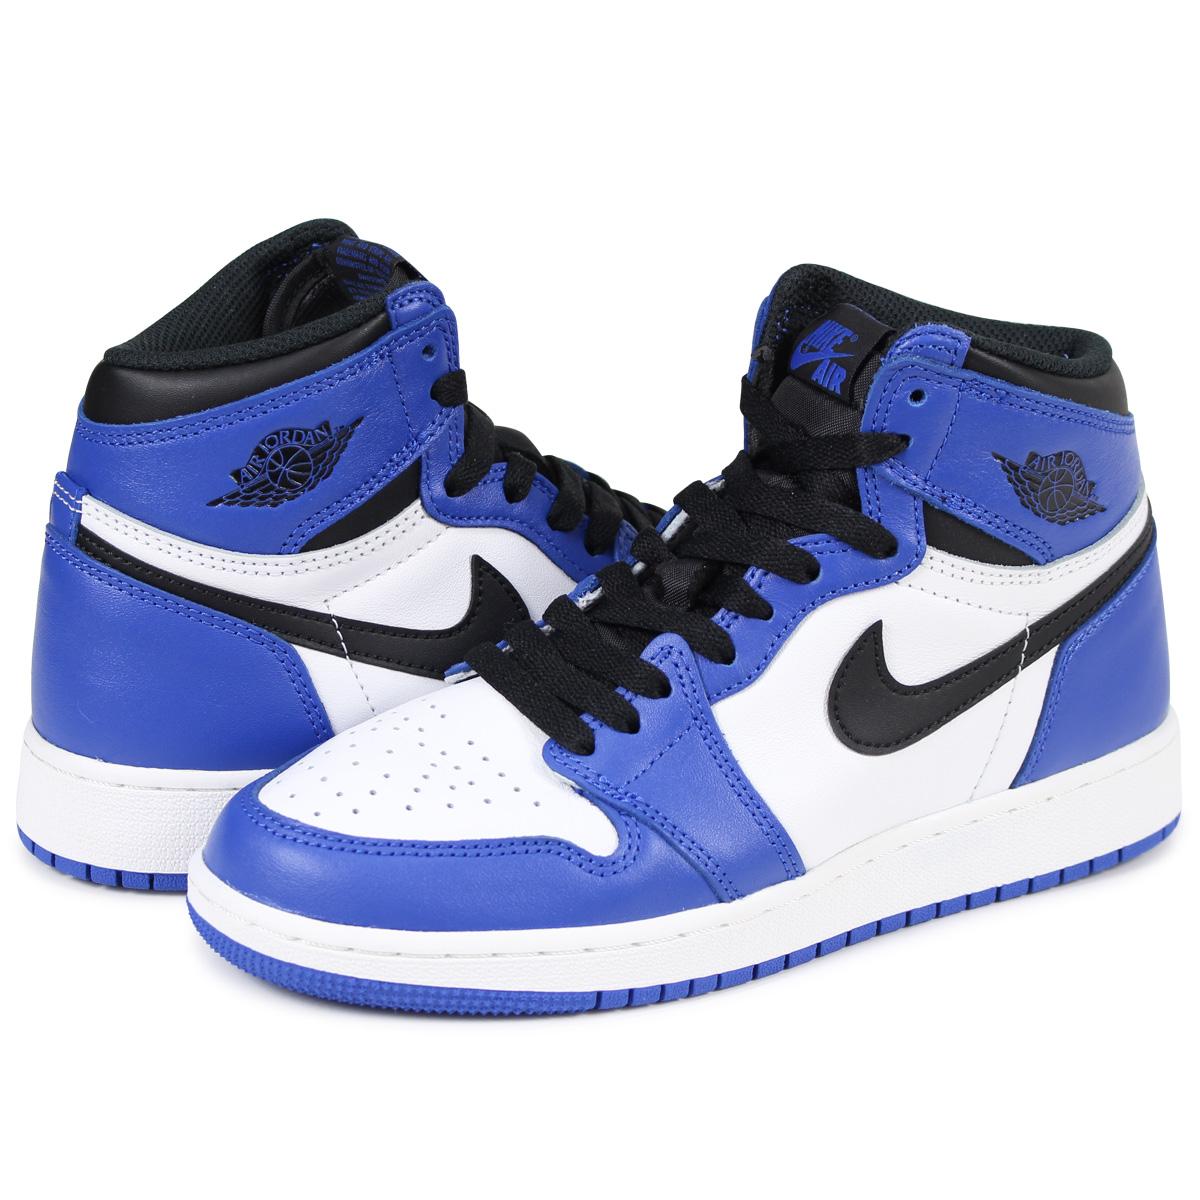 e27a91d01cec NIKE AIR JORDAN 1 RETRO HIGH OG BG GAME ROYAL Nike Air Jordan 1 nostalgic  Haile Dis sneakers 575